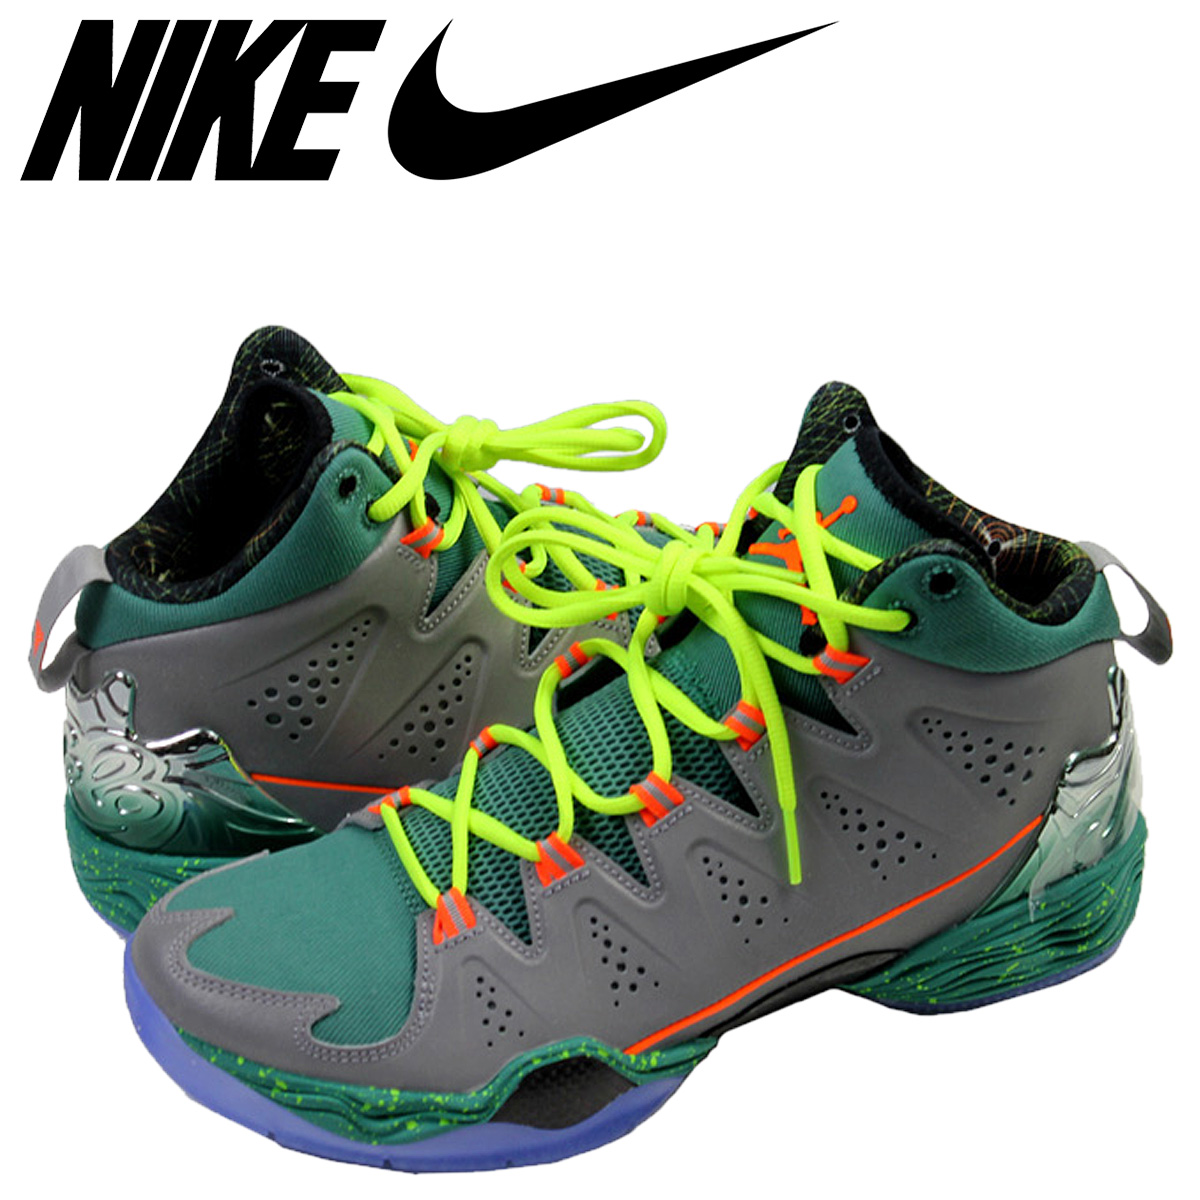 official photos 8357c ecc82 Nike NIKE Air Jordan sneakers AIR JORDAN MELO M10 CHRISTMAS Air Jordan Melo  M10 Christmas 640318-025 grey mens